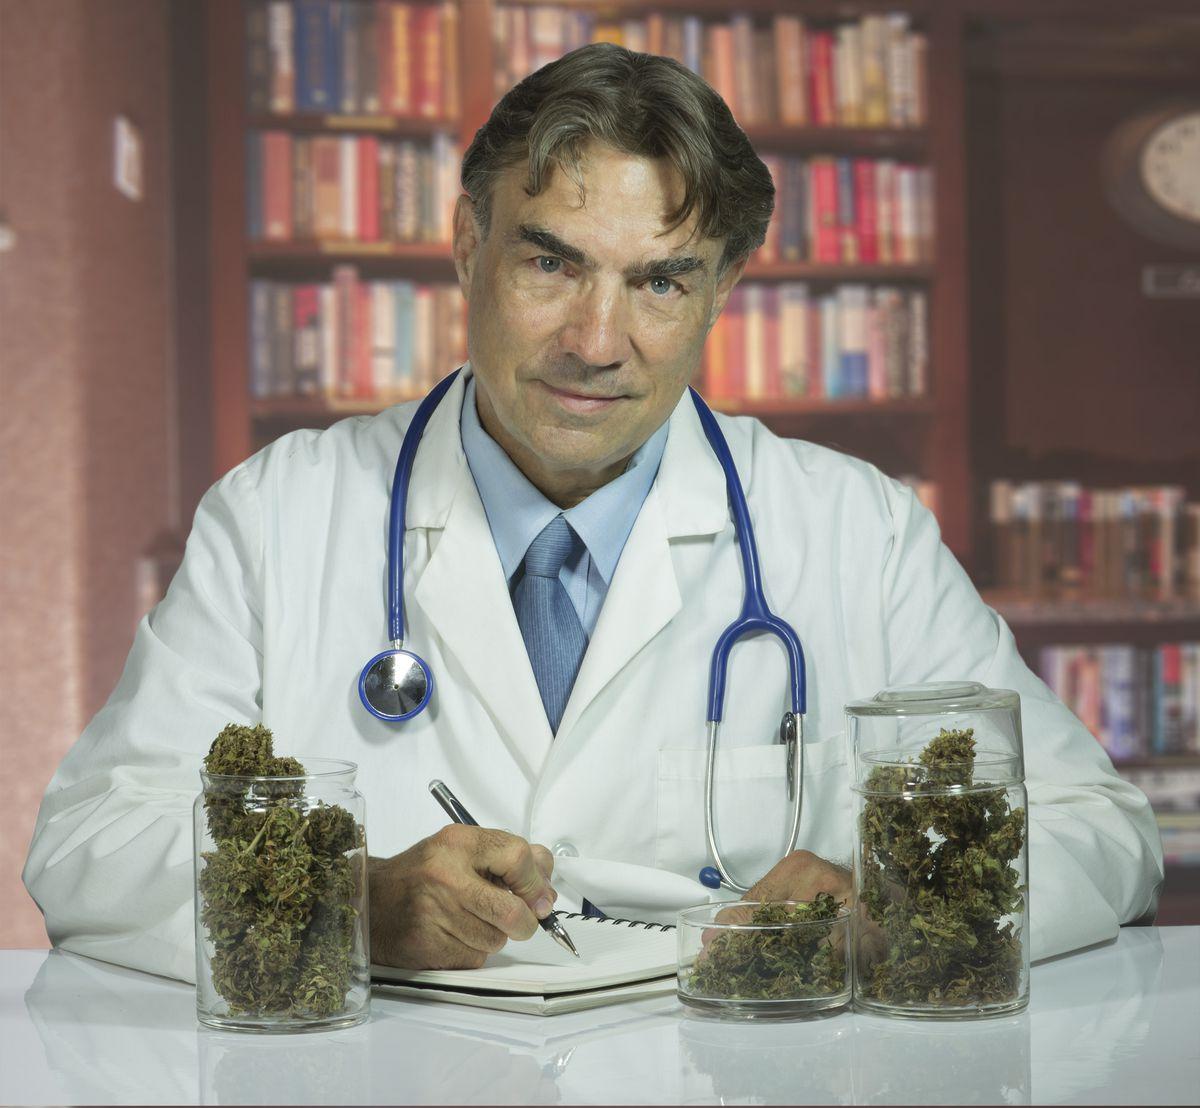 doctor medical marijuana